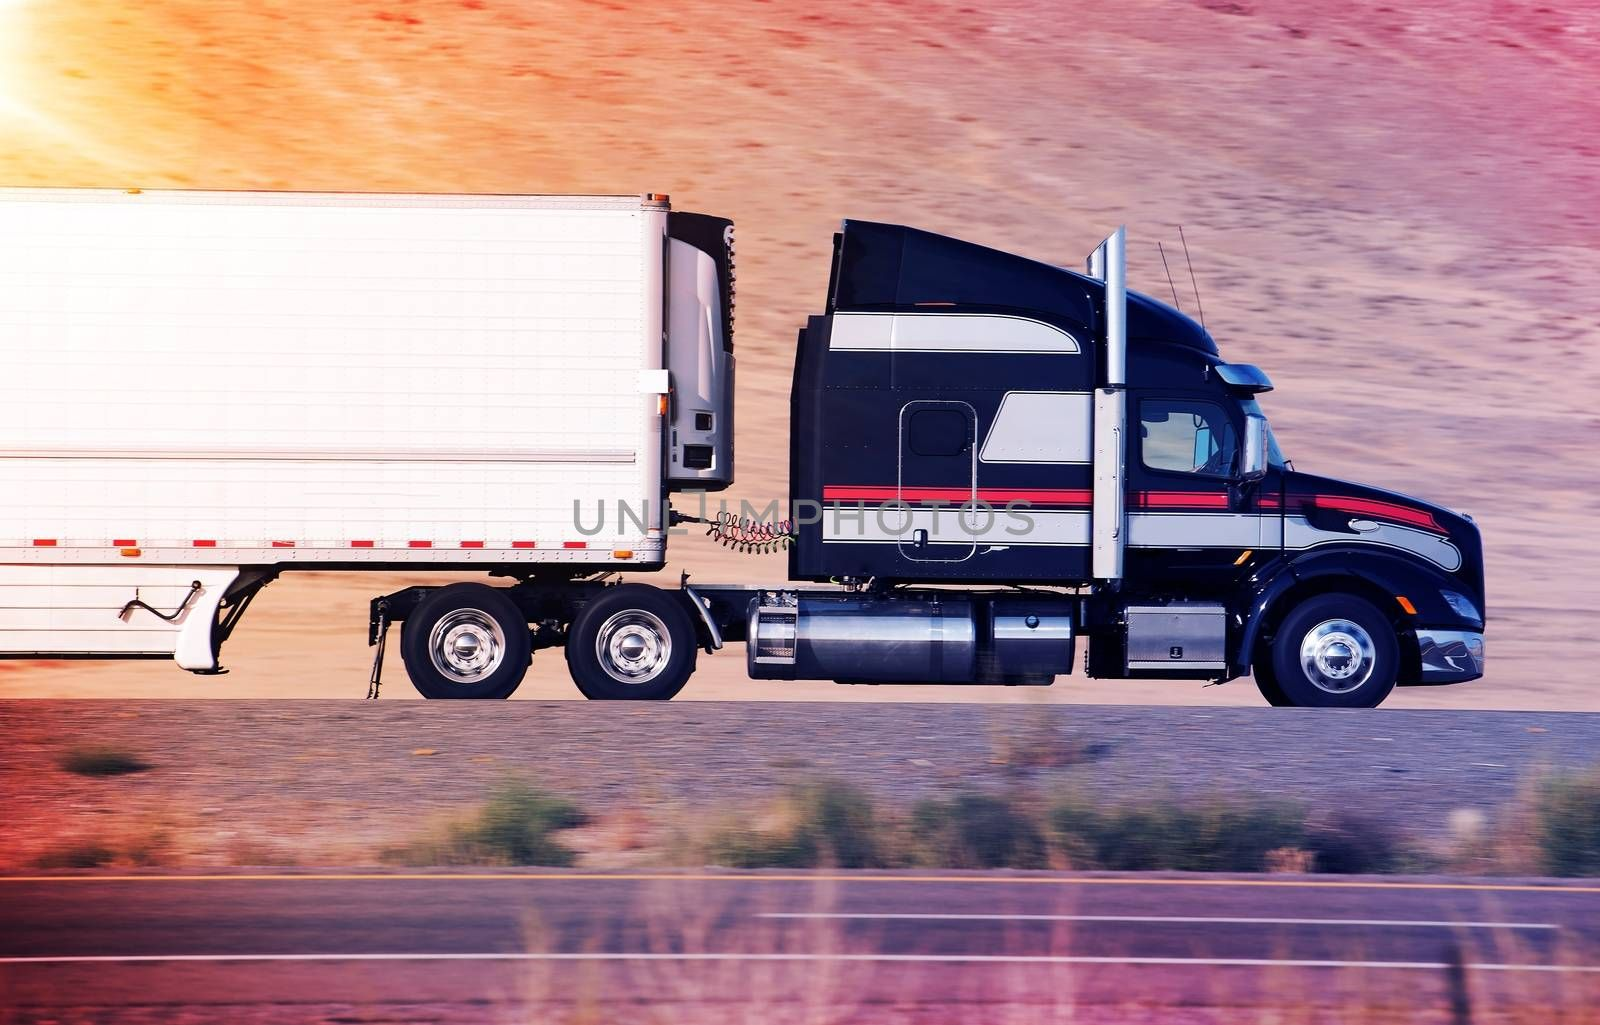 Speeding Semi Truck on a Highway. Heavy Duty Road Transportation Concept.